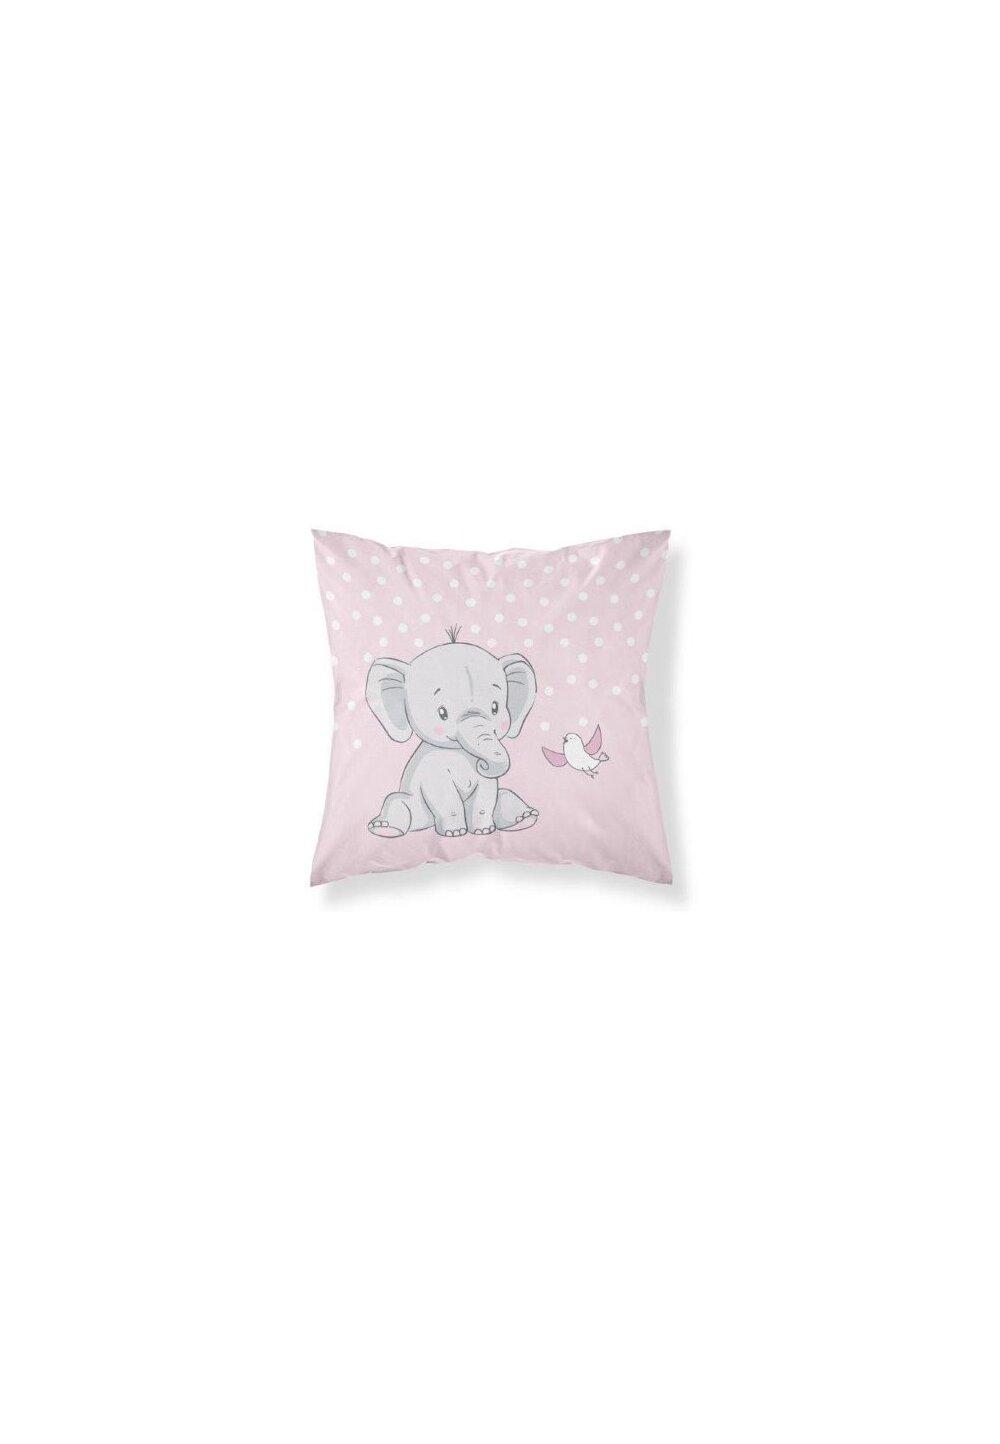 Fata perna, Sweet dreams, roz, 40x40 cm imagine